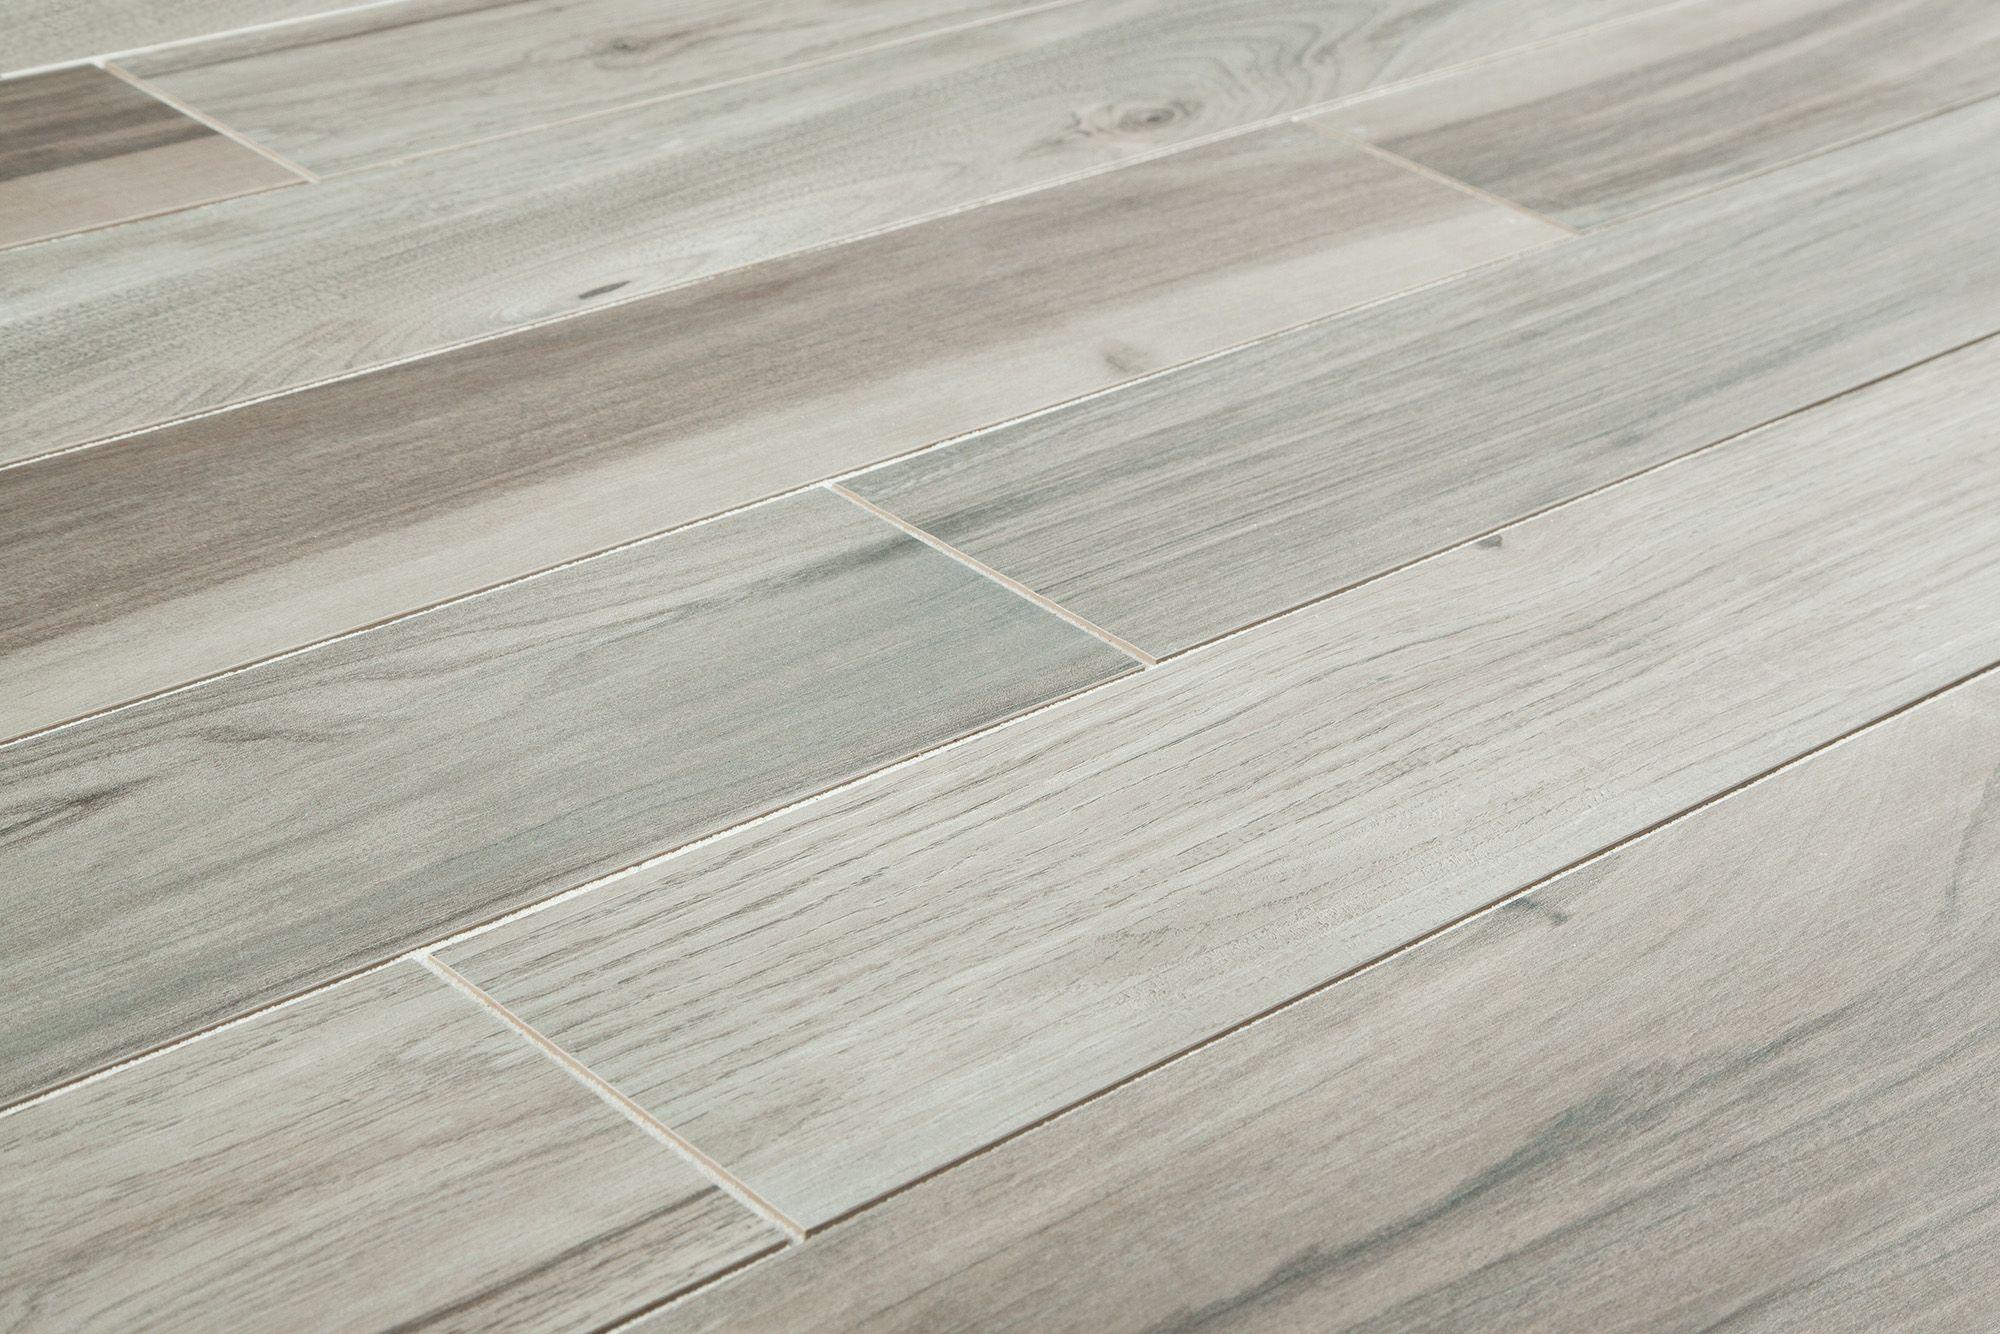 Rno Porcelain Tile Wilderness Series Wood Floors